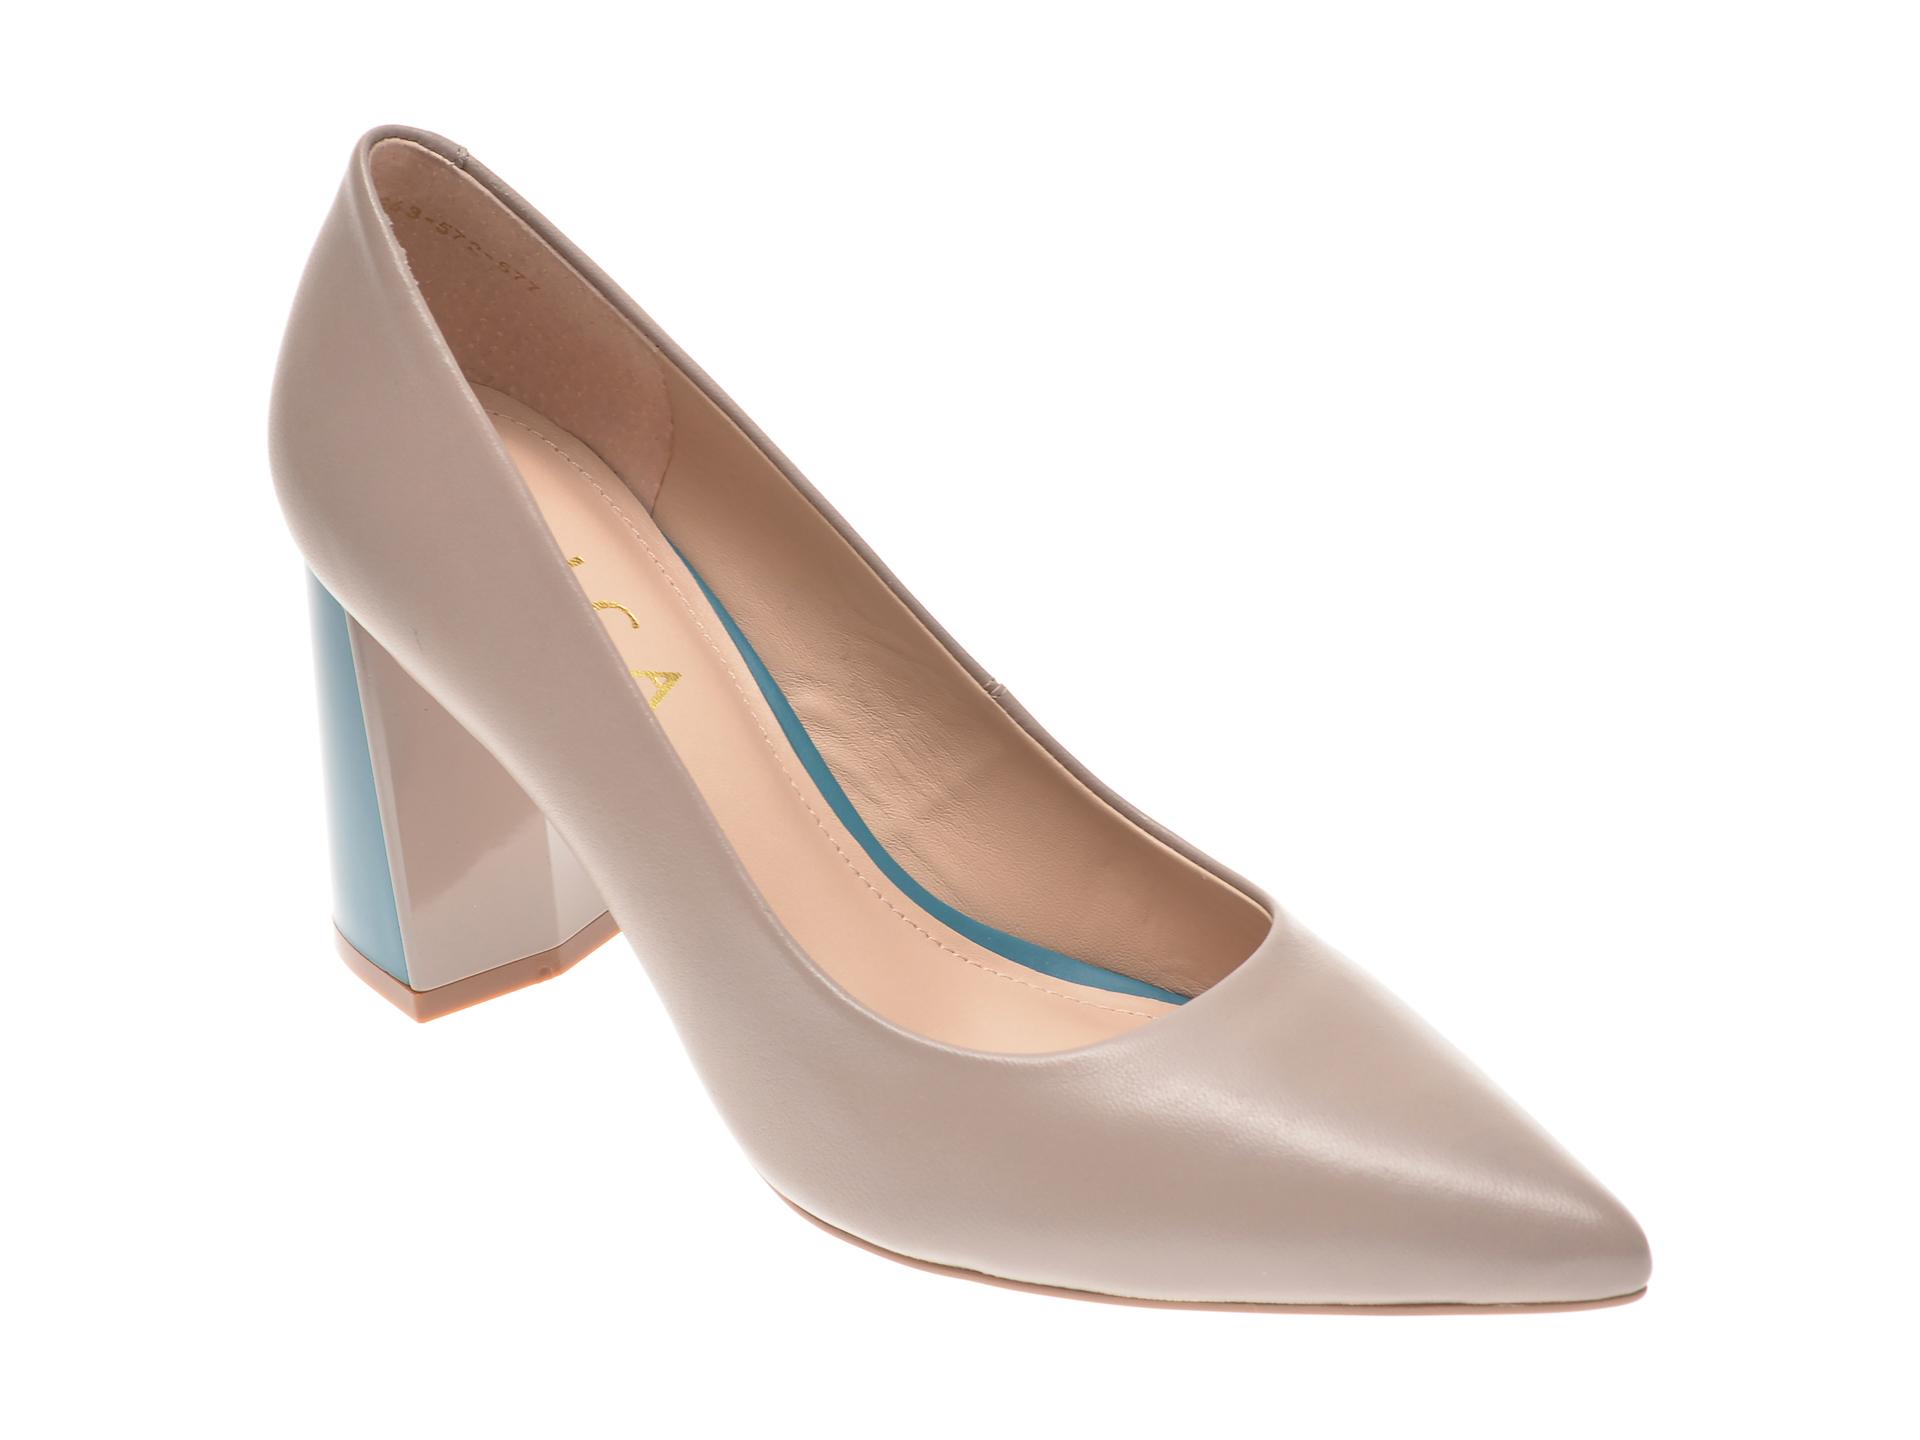 Pantofi EPICA gri, 1843572, din piele naturala